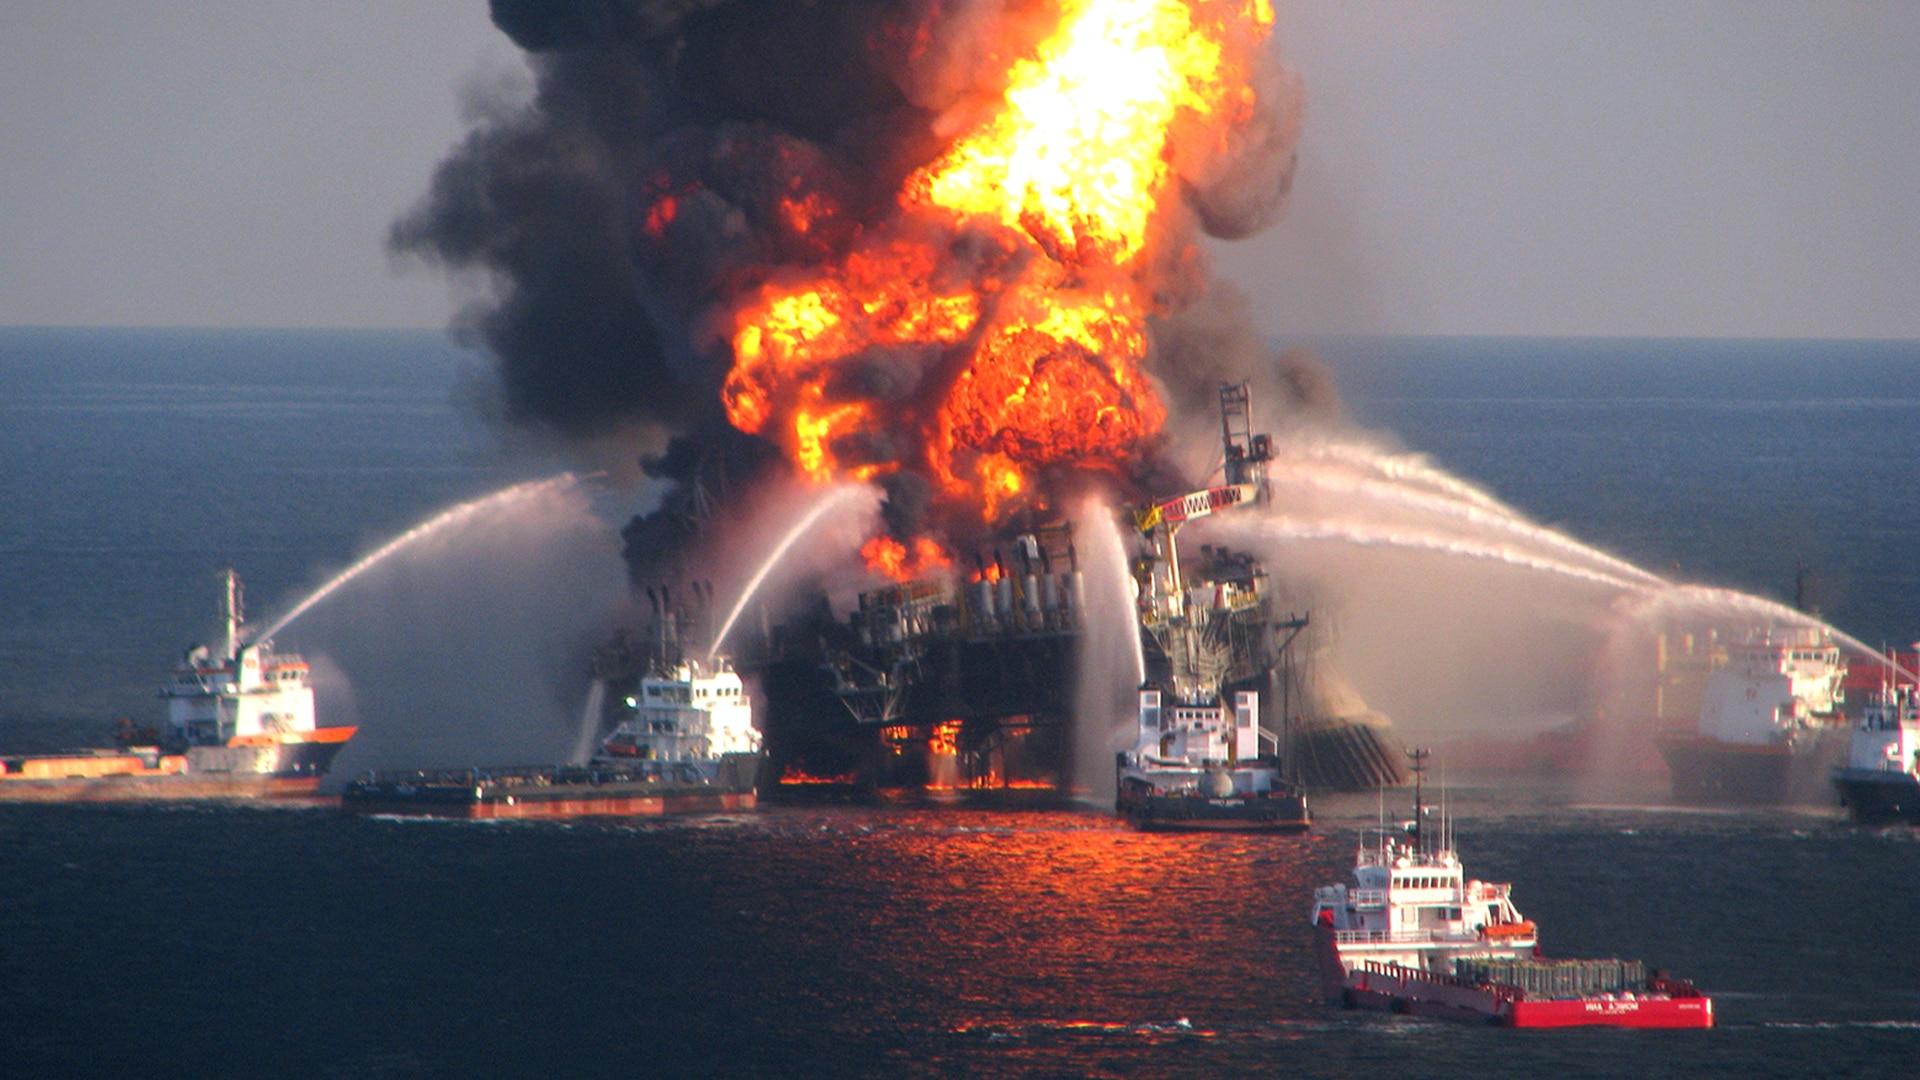 Parvati Foundation, MAPS, the Marine Arctic Peace Sanctuary, fossil fuel bailouts